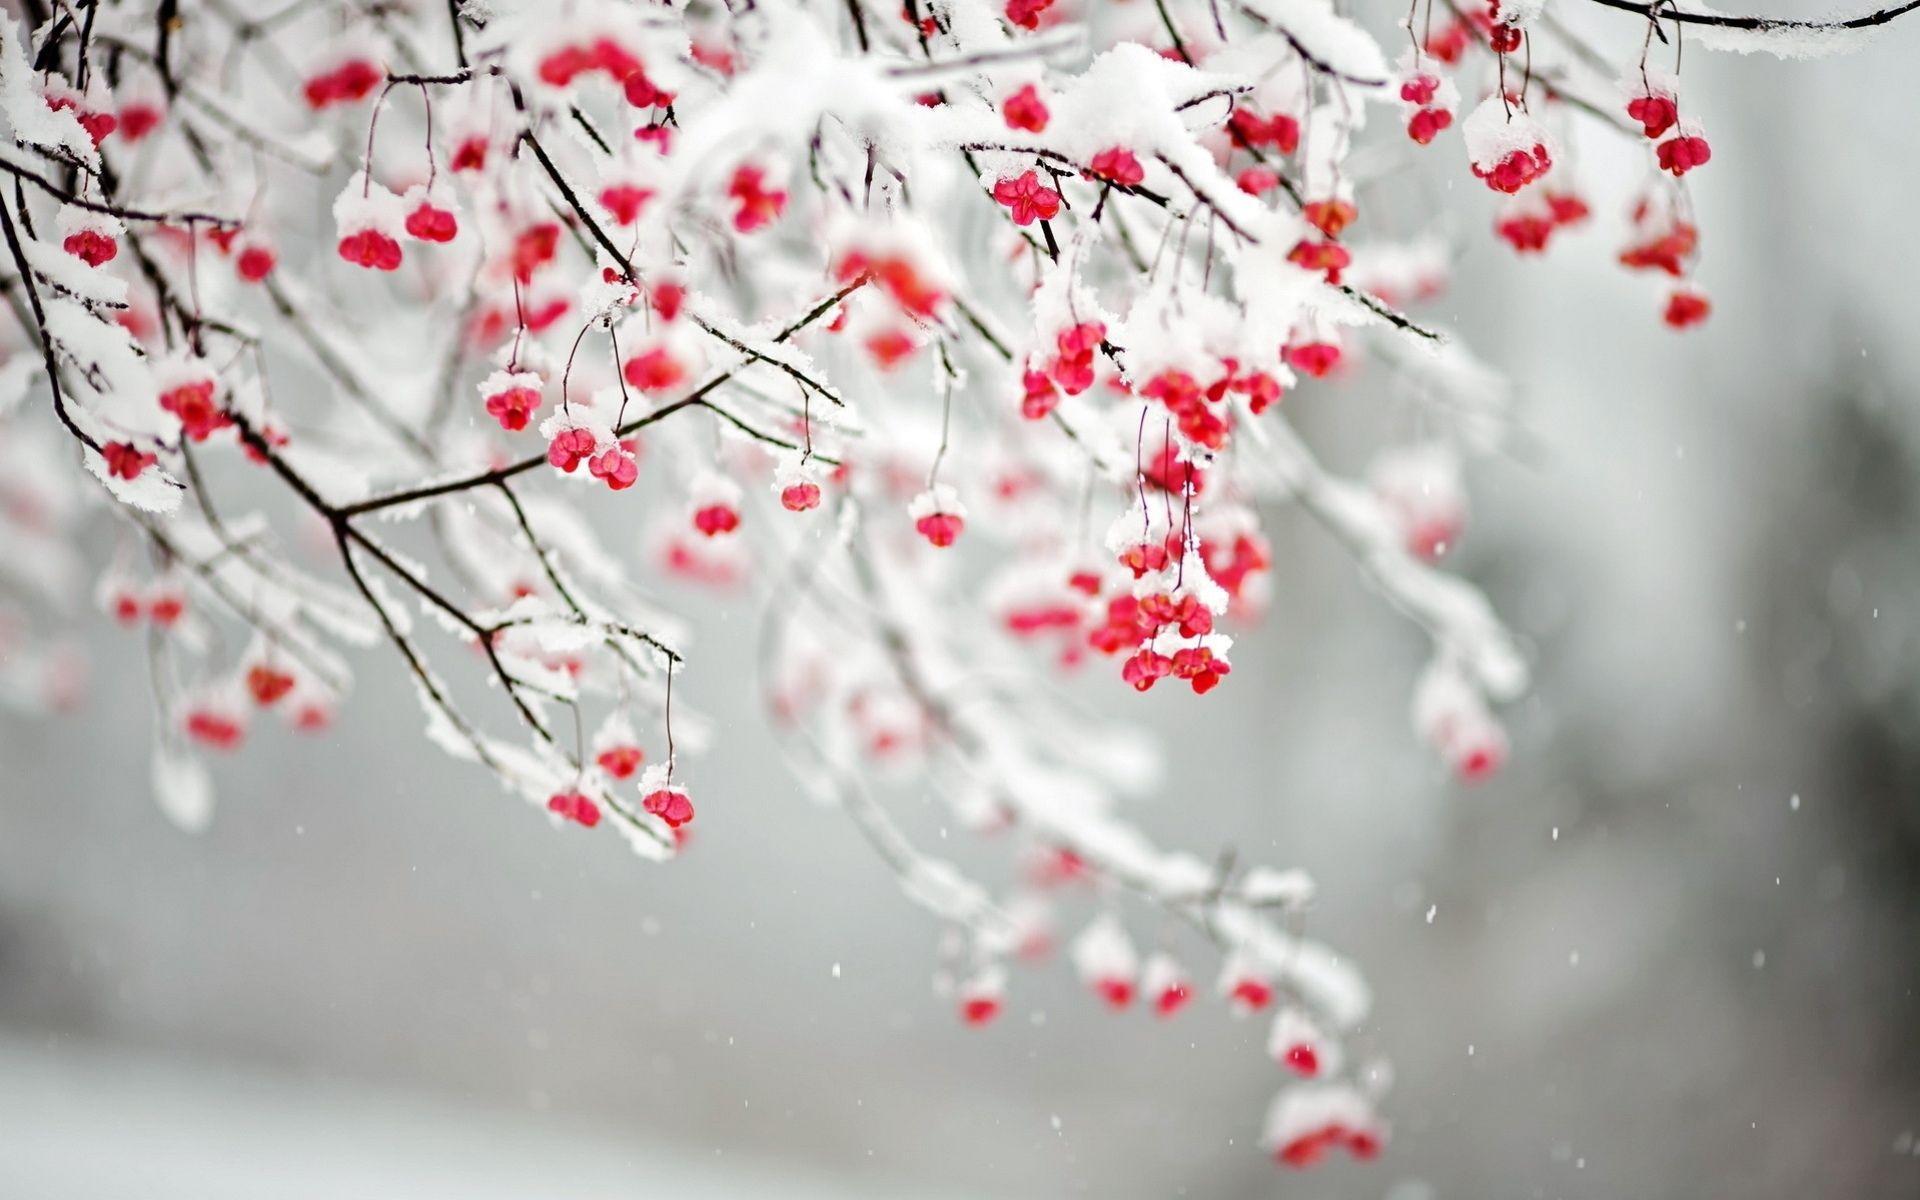 Winter Flower Desktop Wallpapers , Top Free Winter Flower